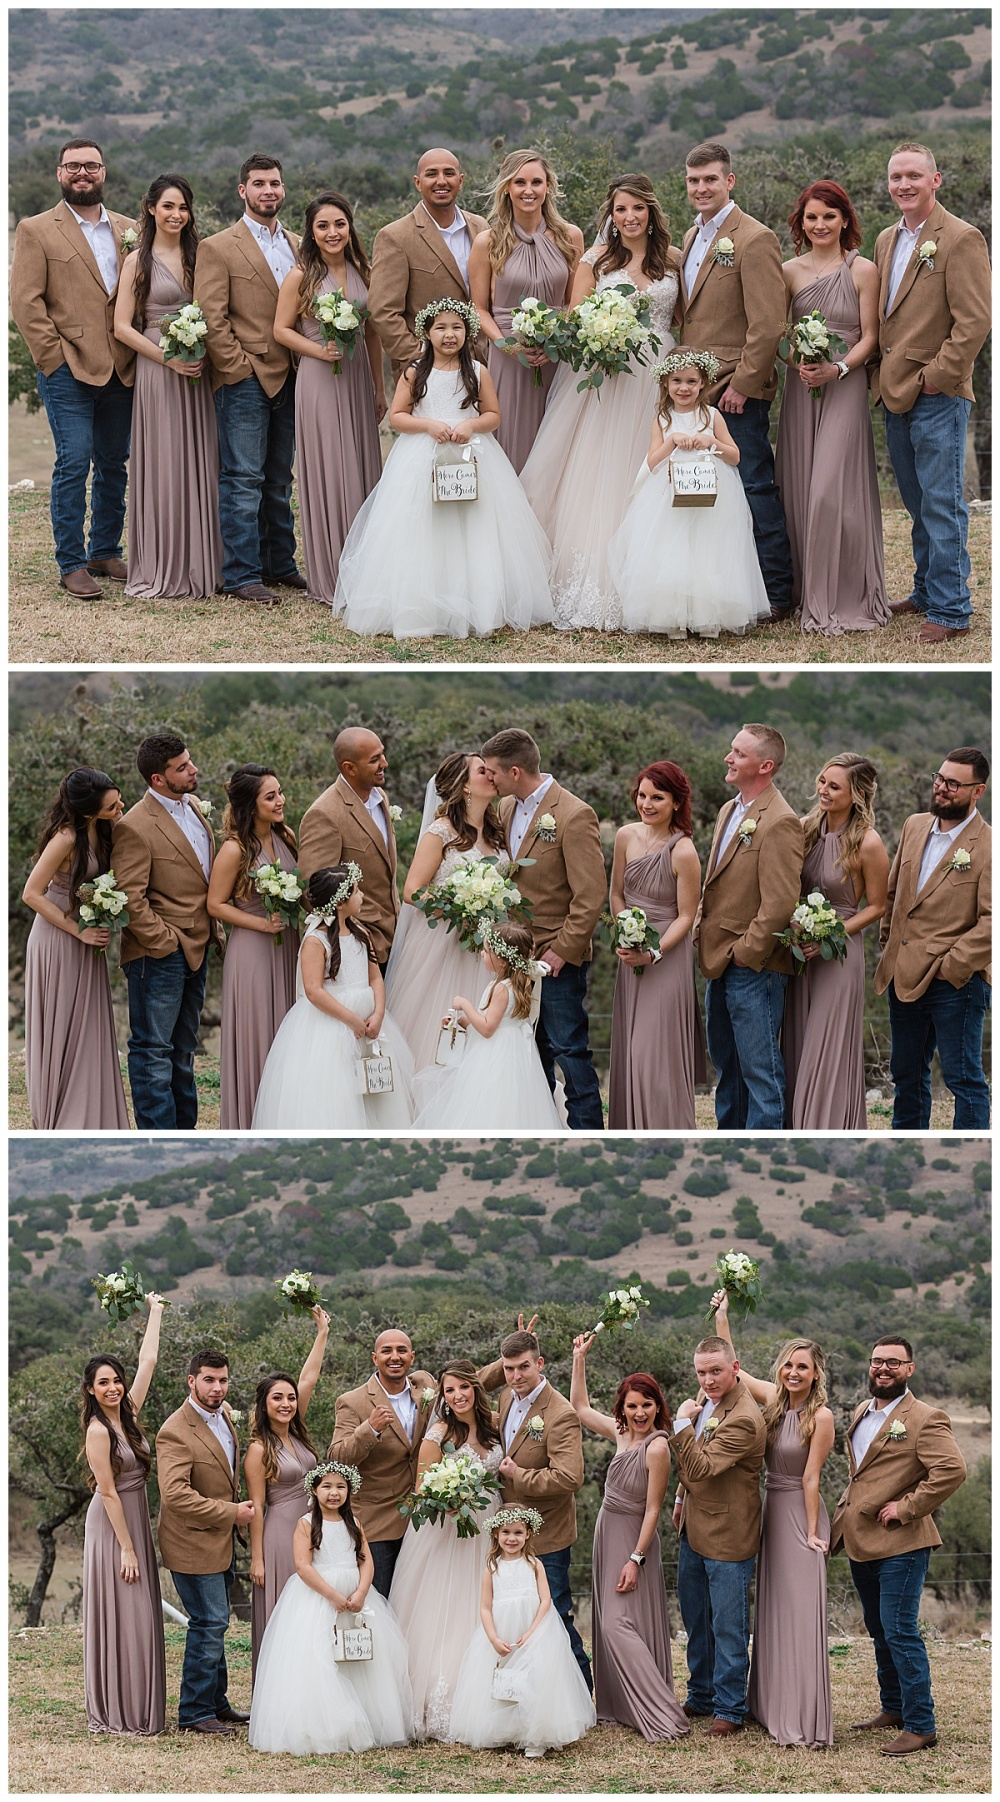 Wedding-Photographer-Texas-Hill-Country-Happy-H-Ranch-Comfor-Texas-Carly-Barton-Photography_0038.jpg